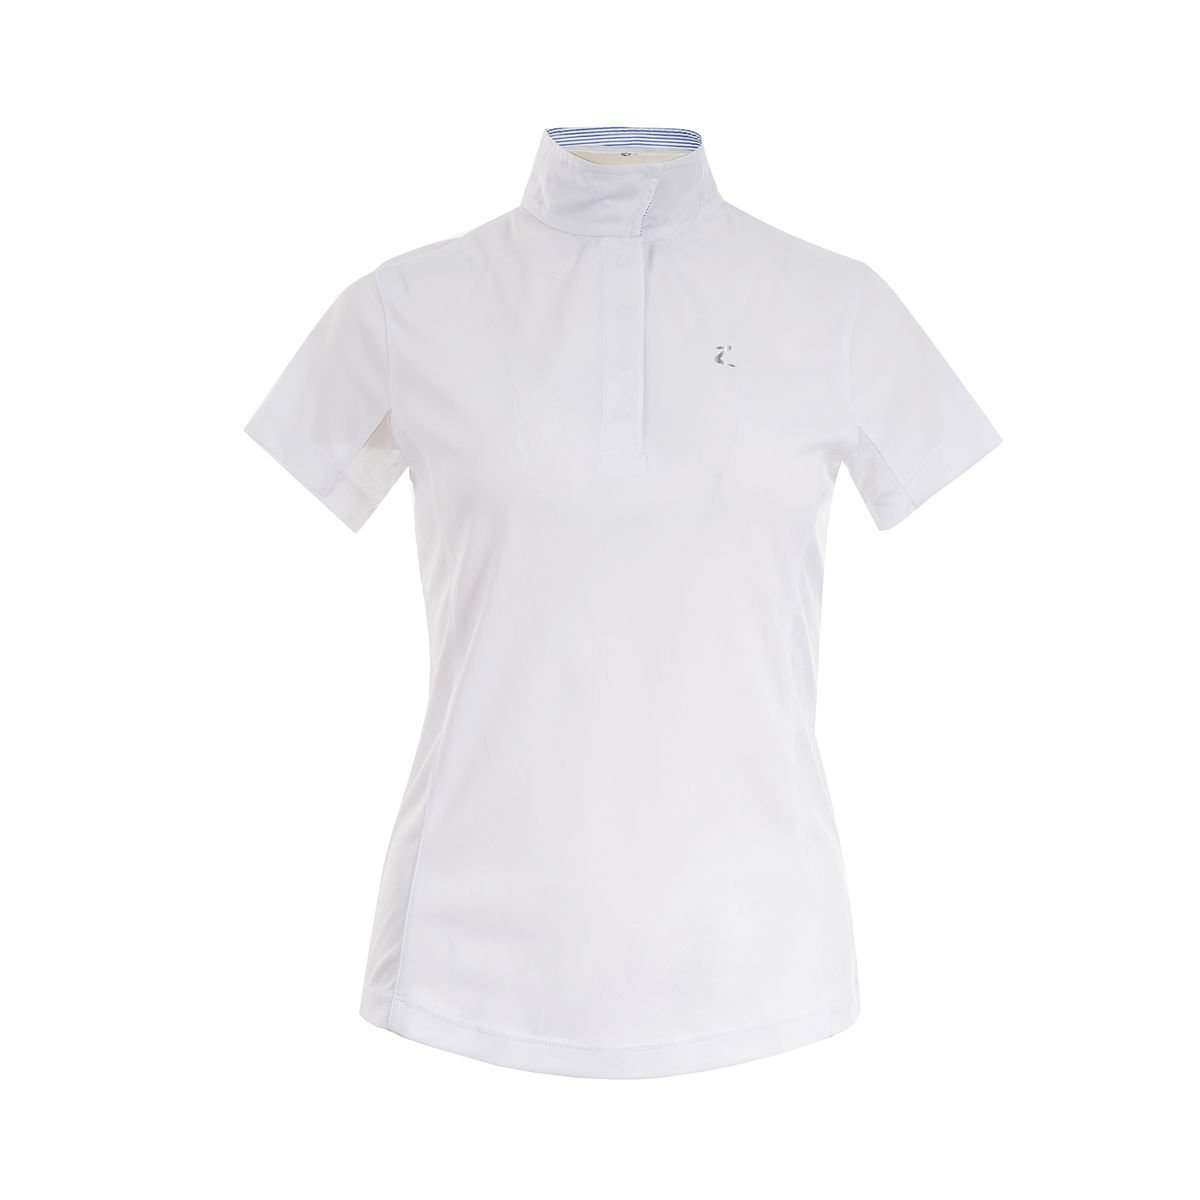 Horze BlaireホワイトWomen 's Functional short-sleeved Showシャツ( US 4 / EU 34 )   B0727NQGMH